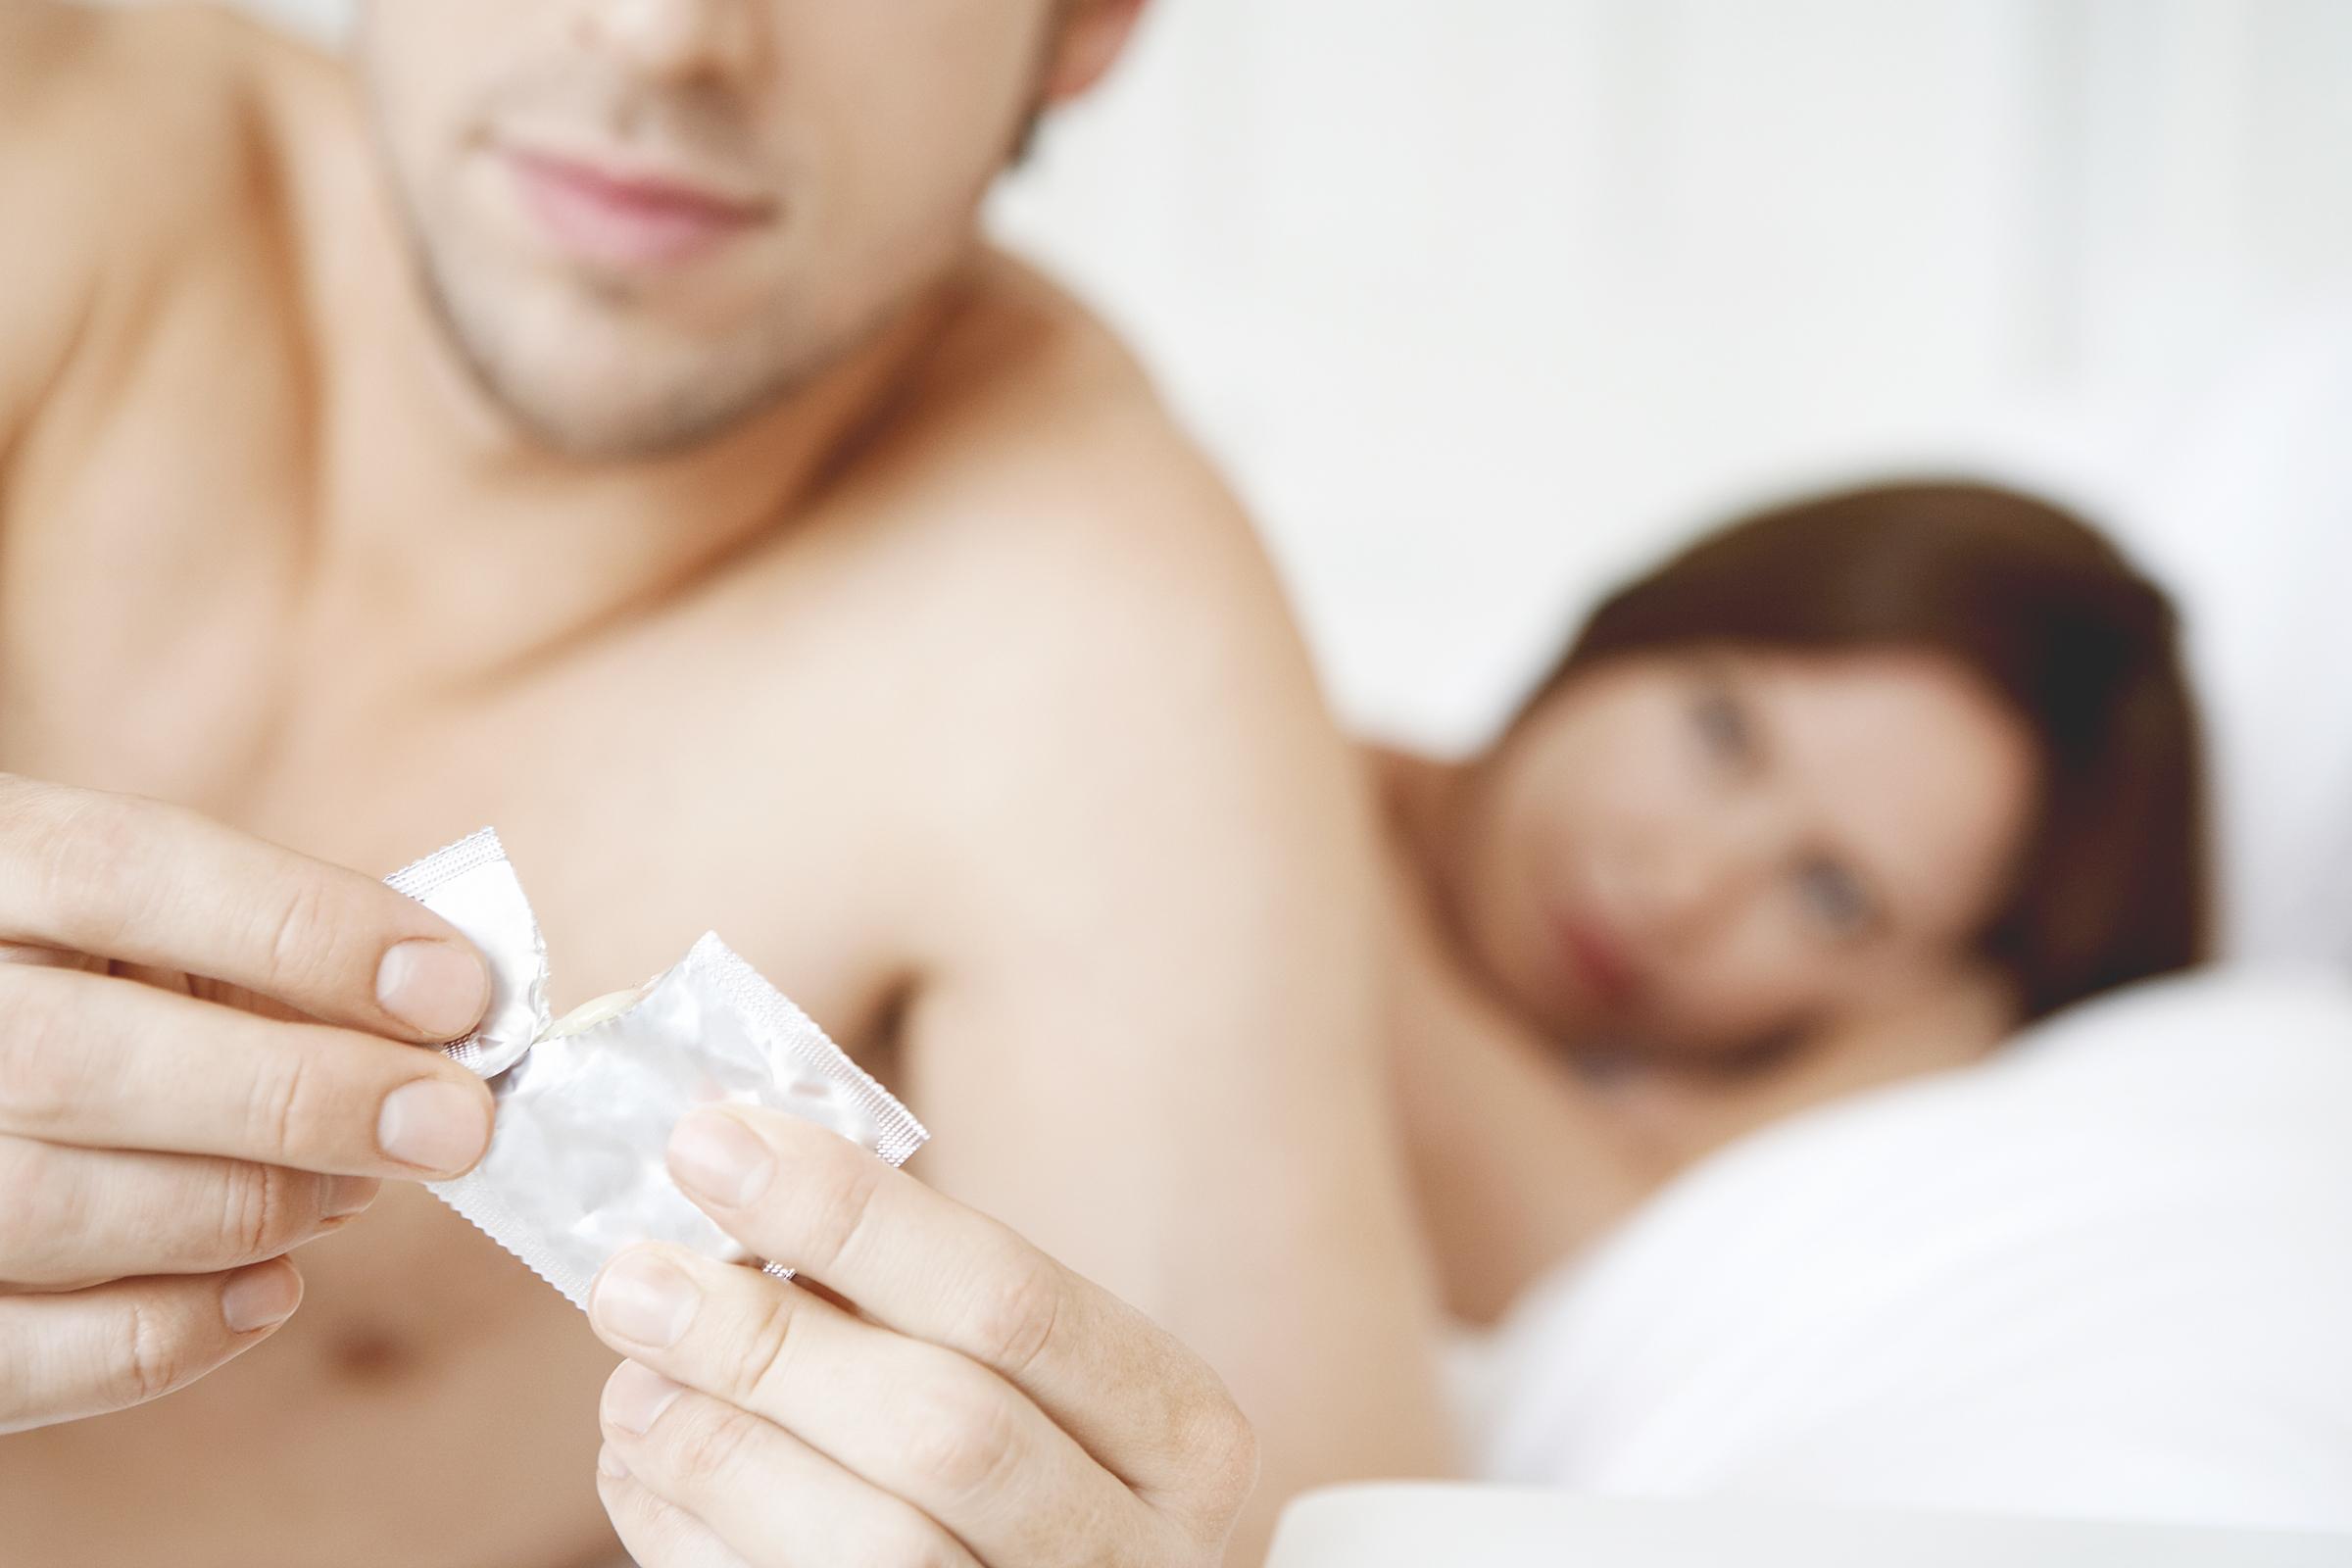 Pisilni, amikor orgazmus